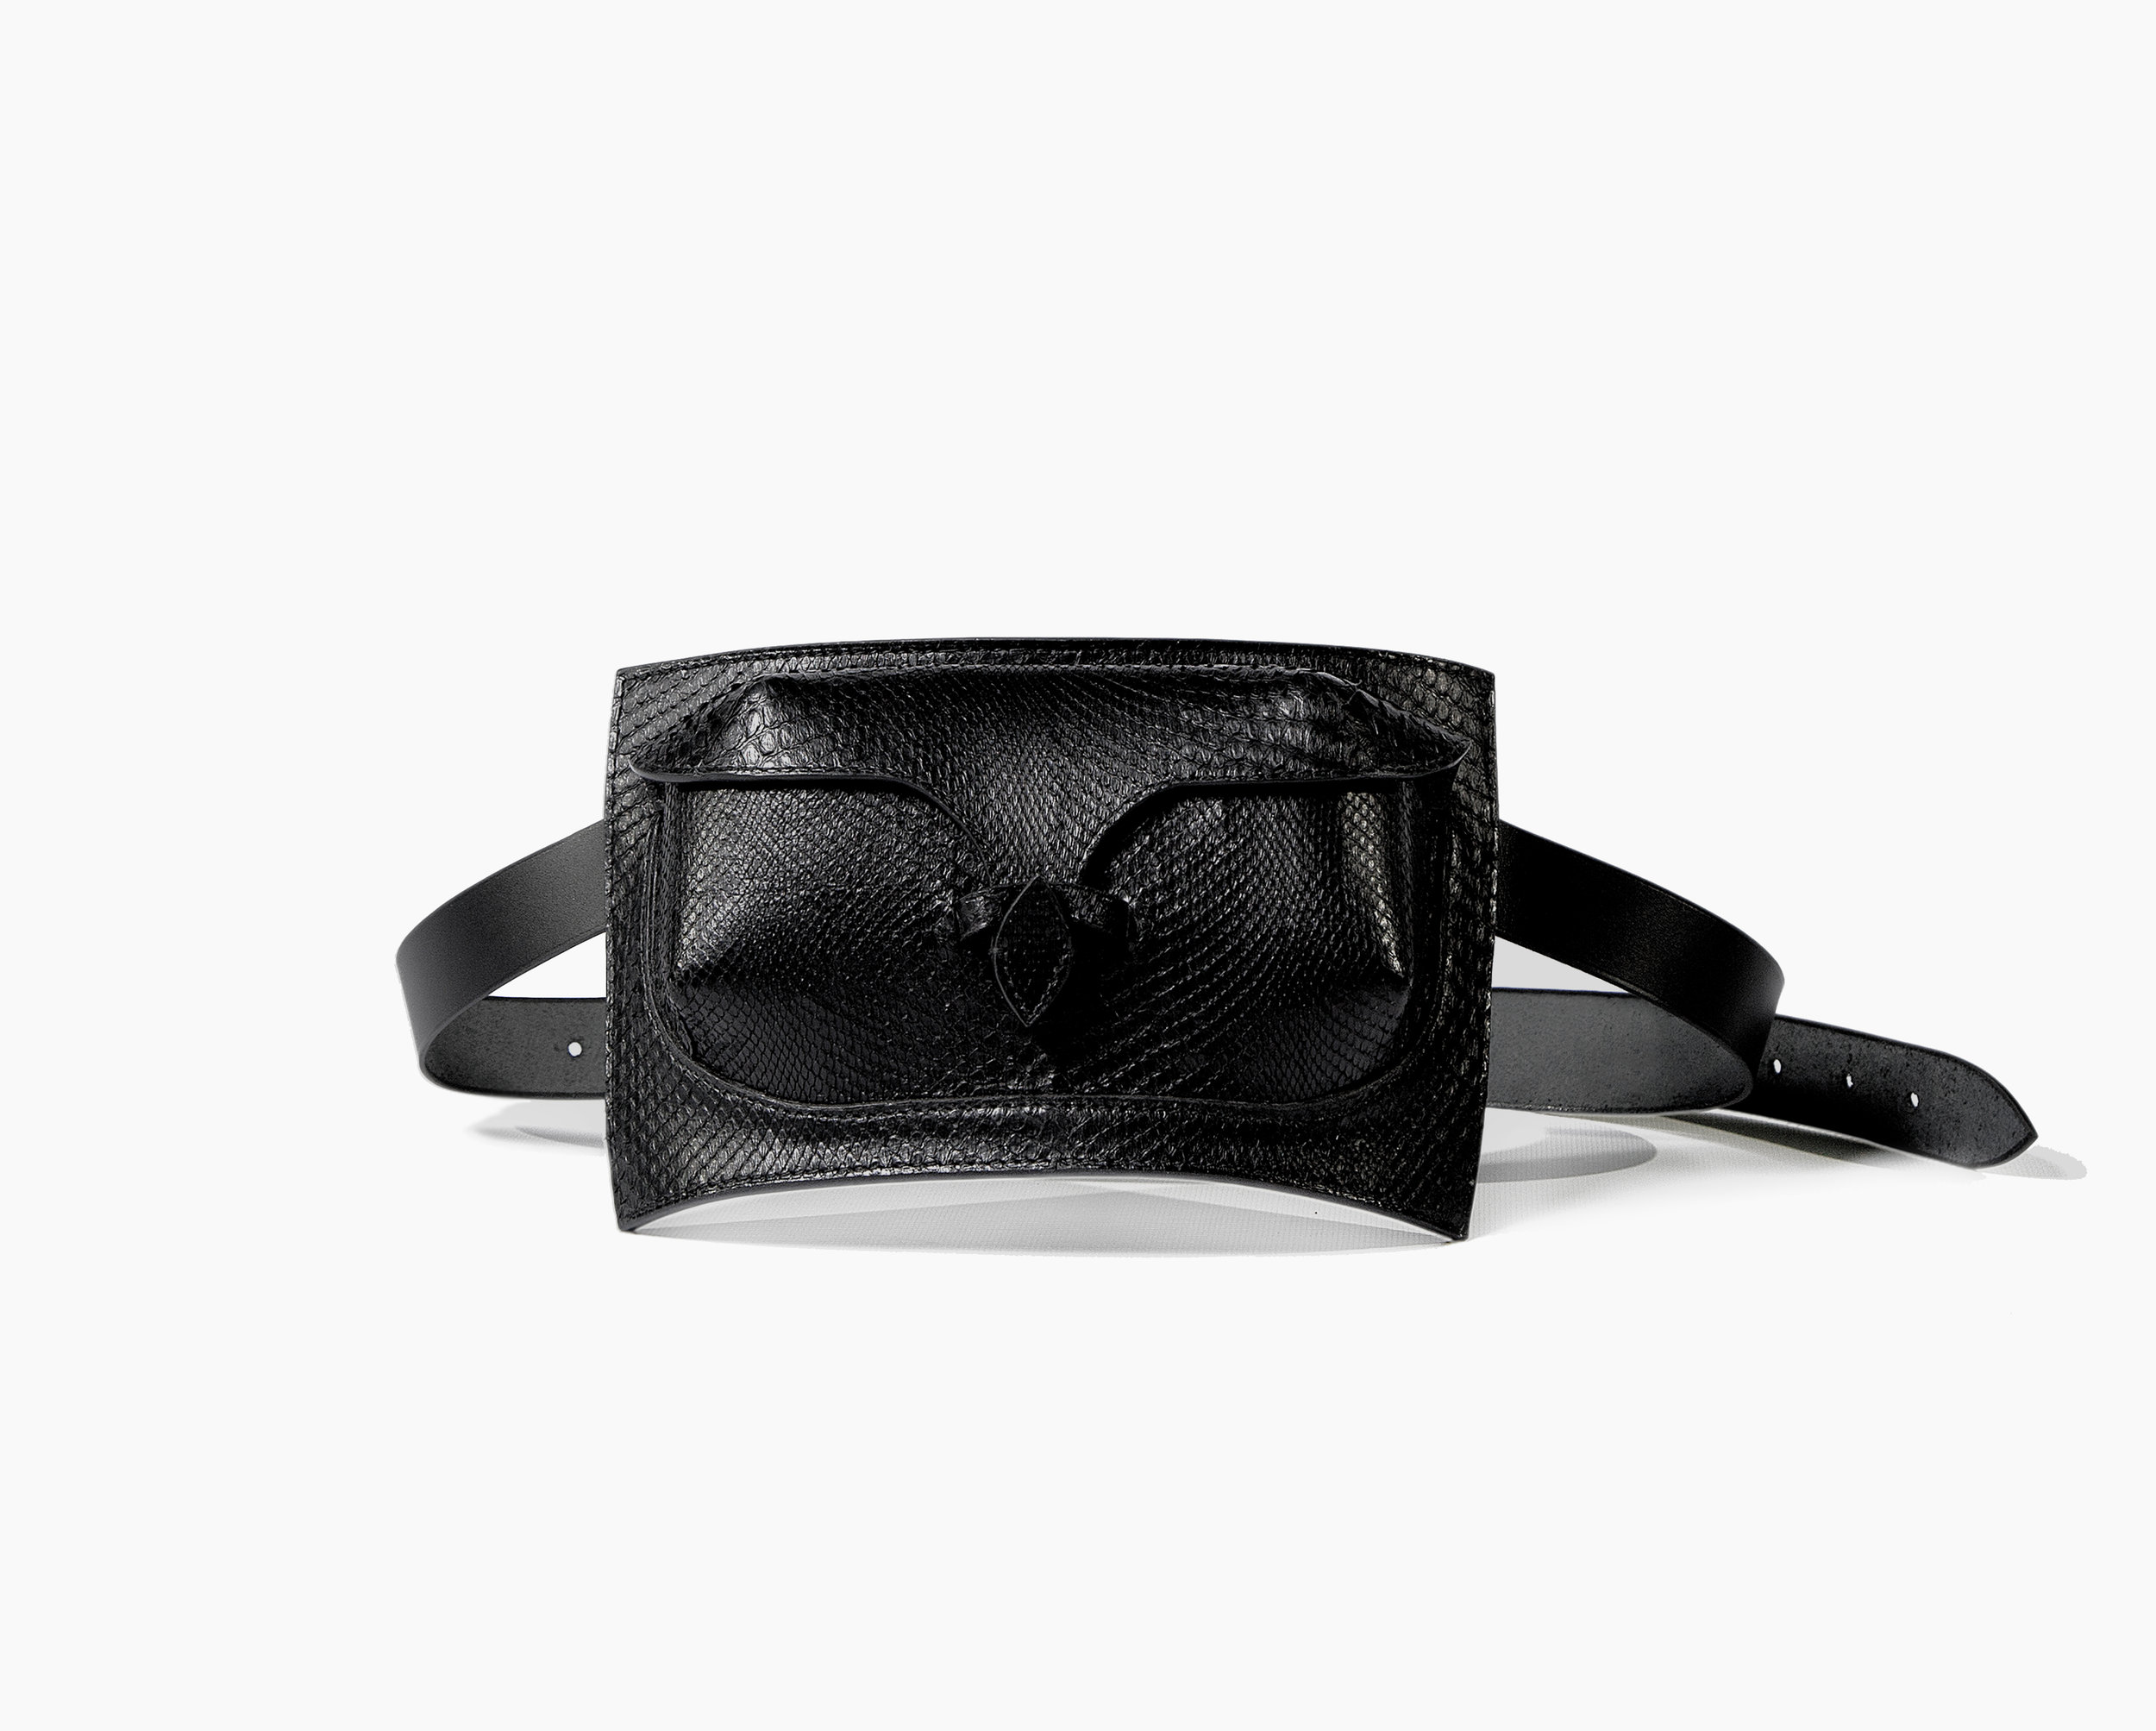 ASWAD-Ajar-Beltbag-python-Black-1.jpg